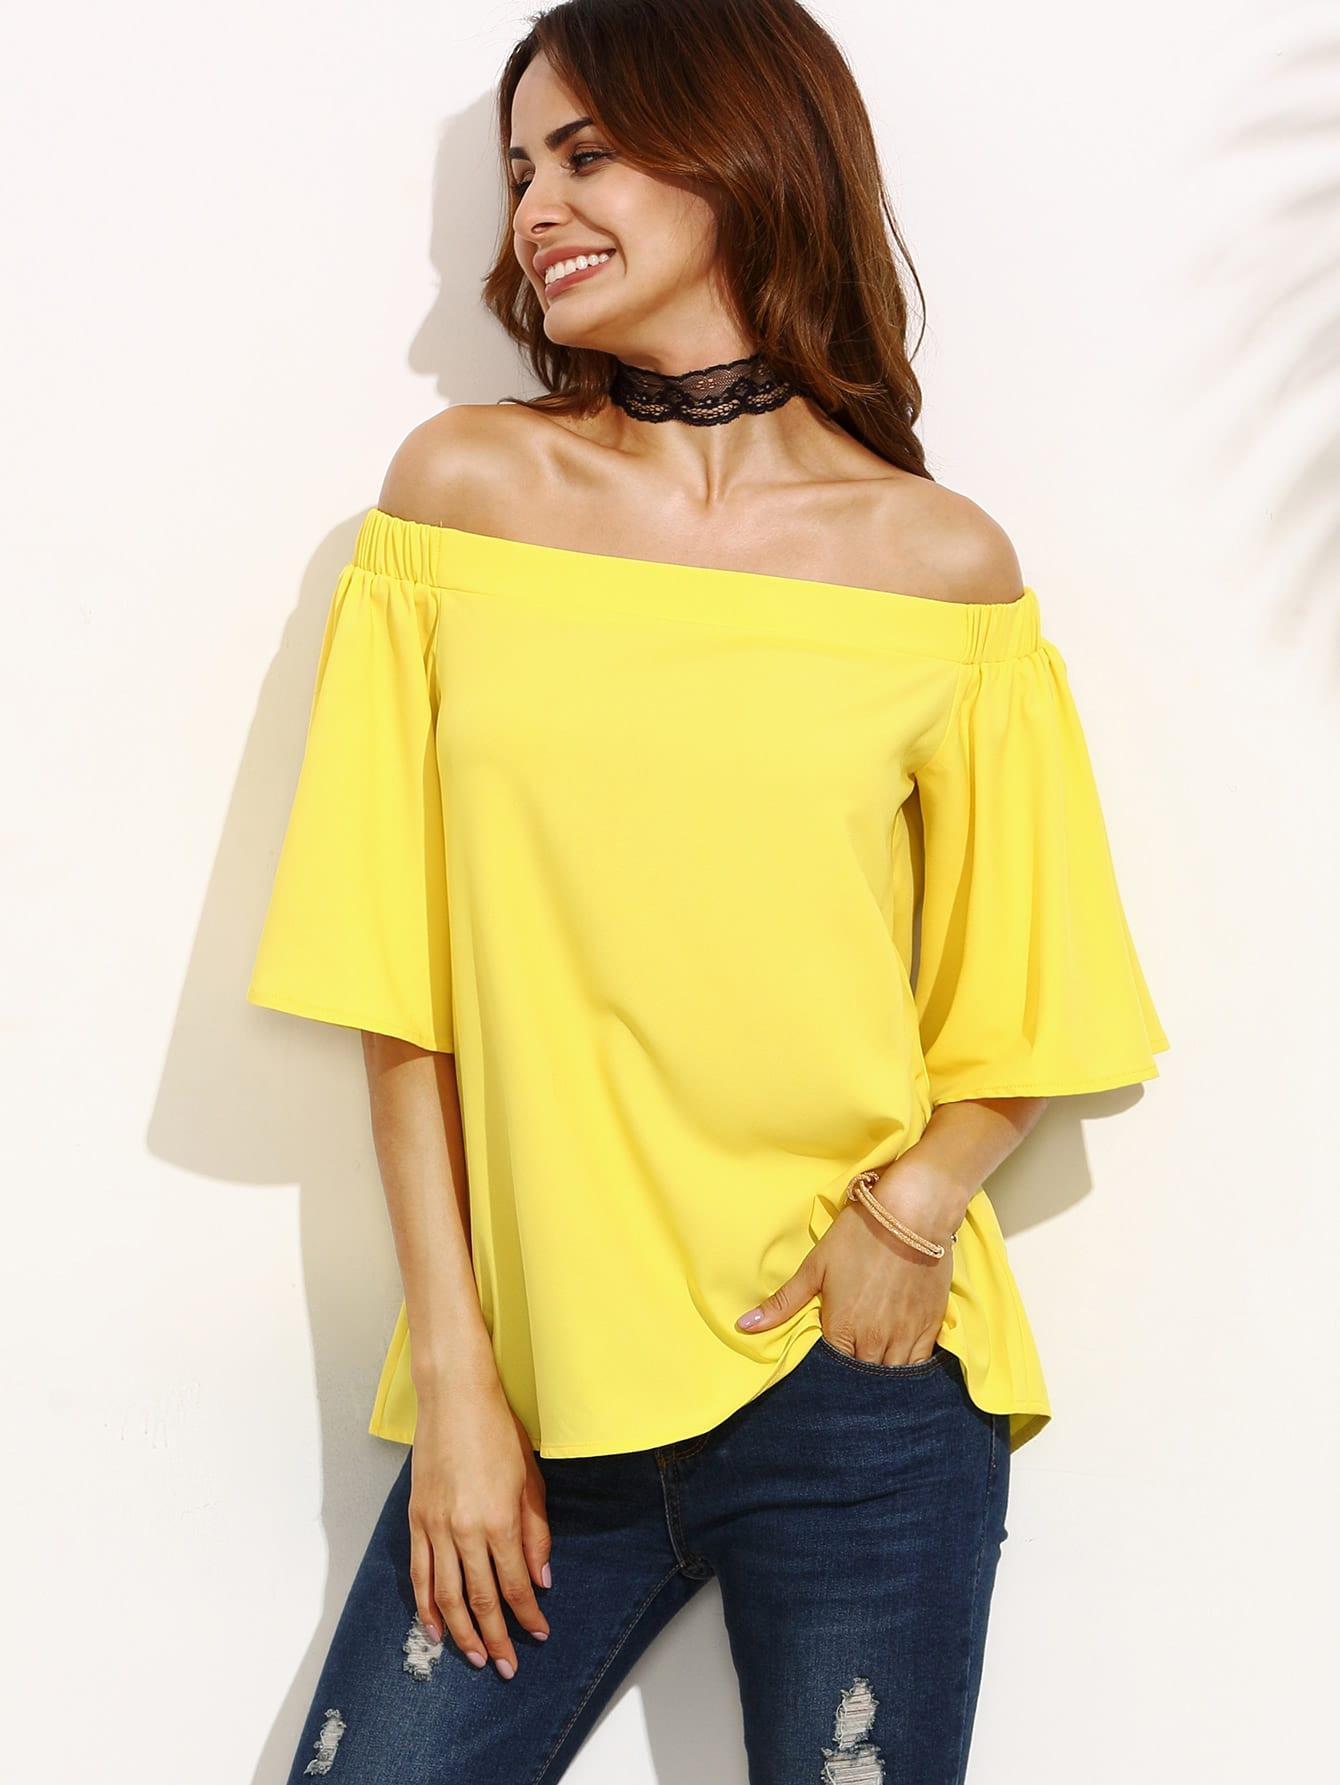 blouse160727504_3